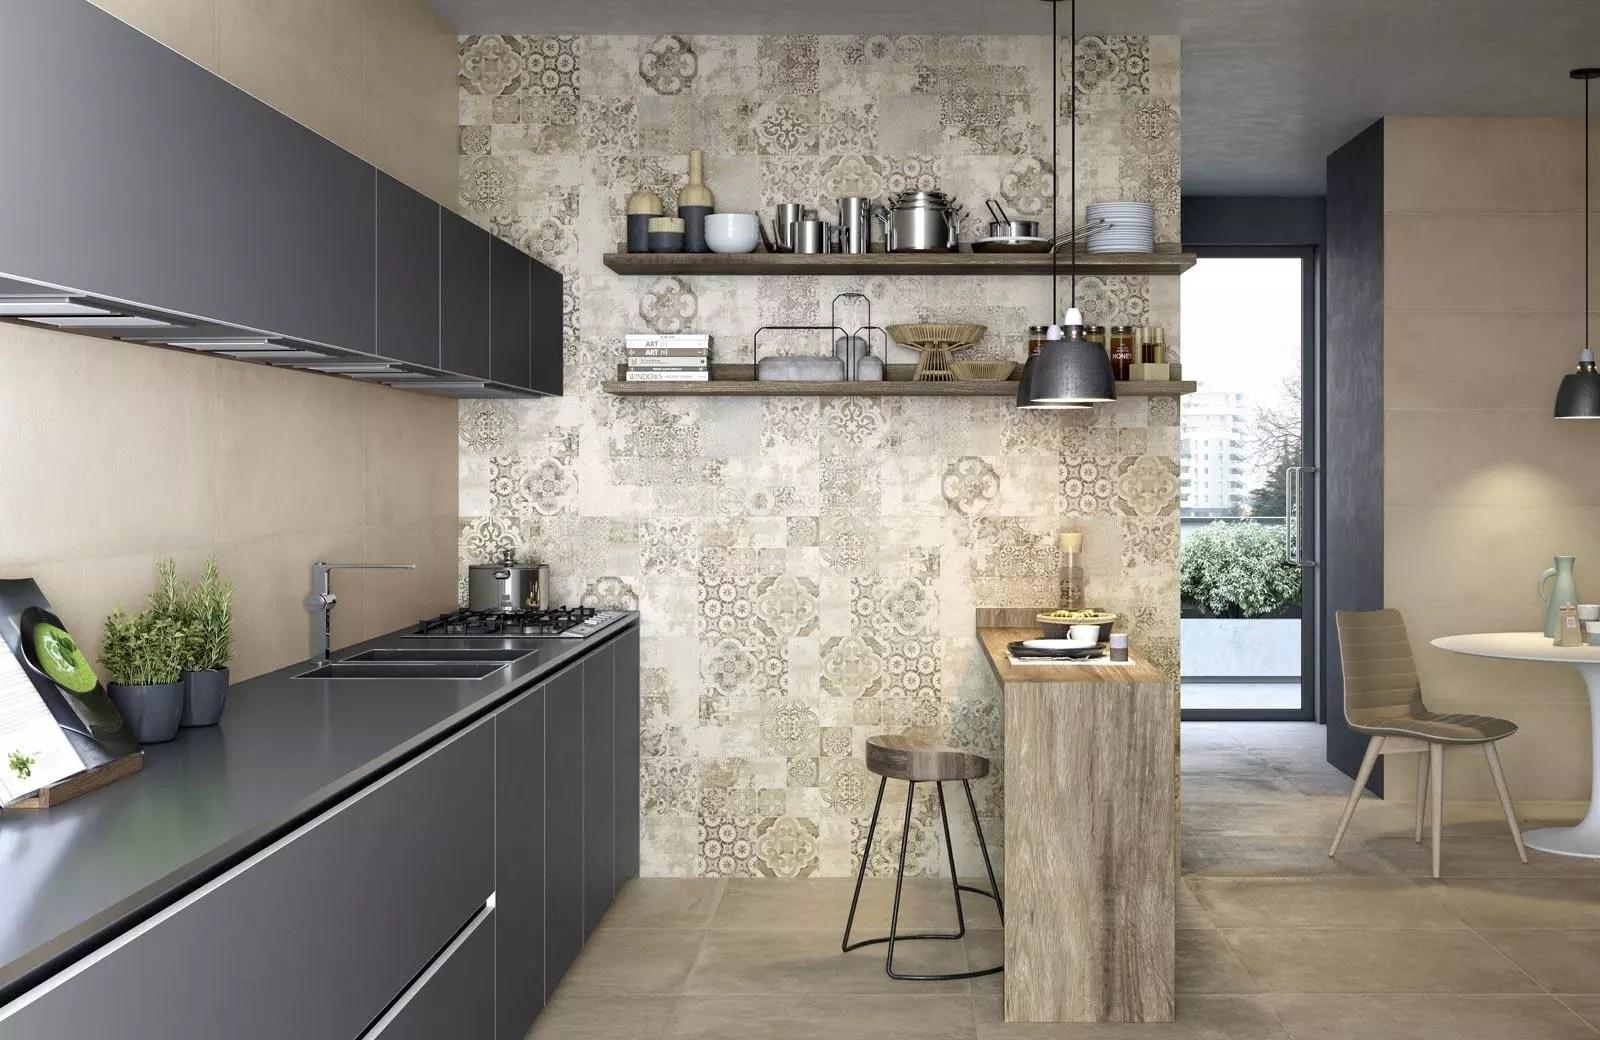 Piastrelle cucina stile siciliano piastrelle decorate siciliane